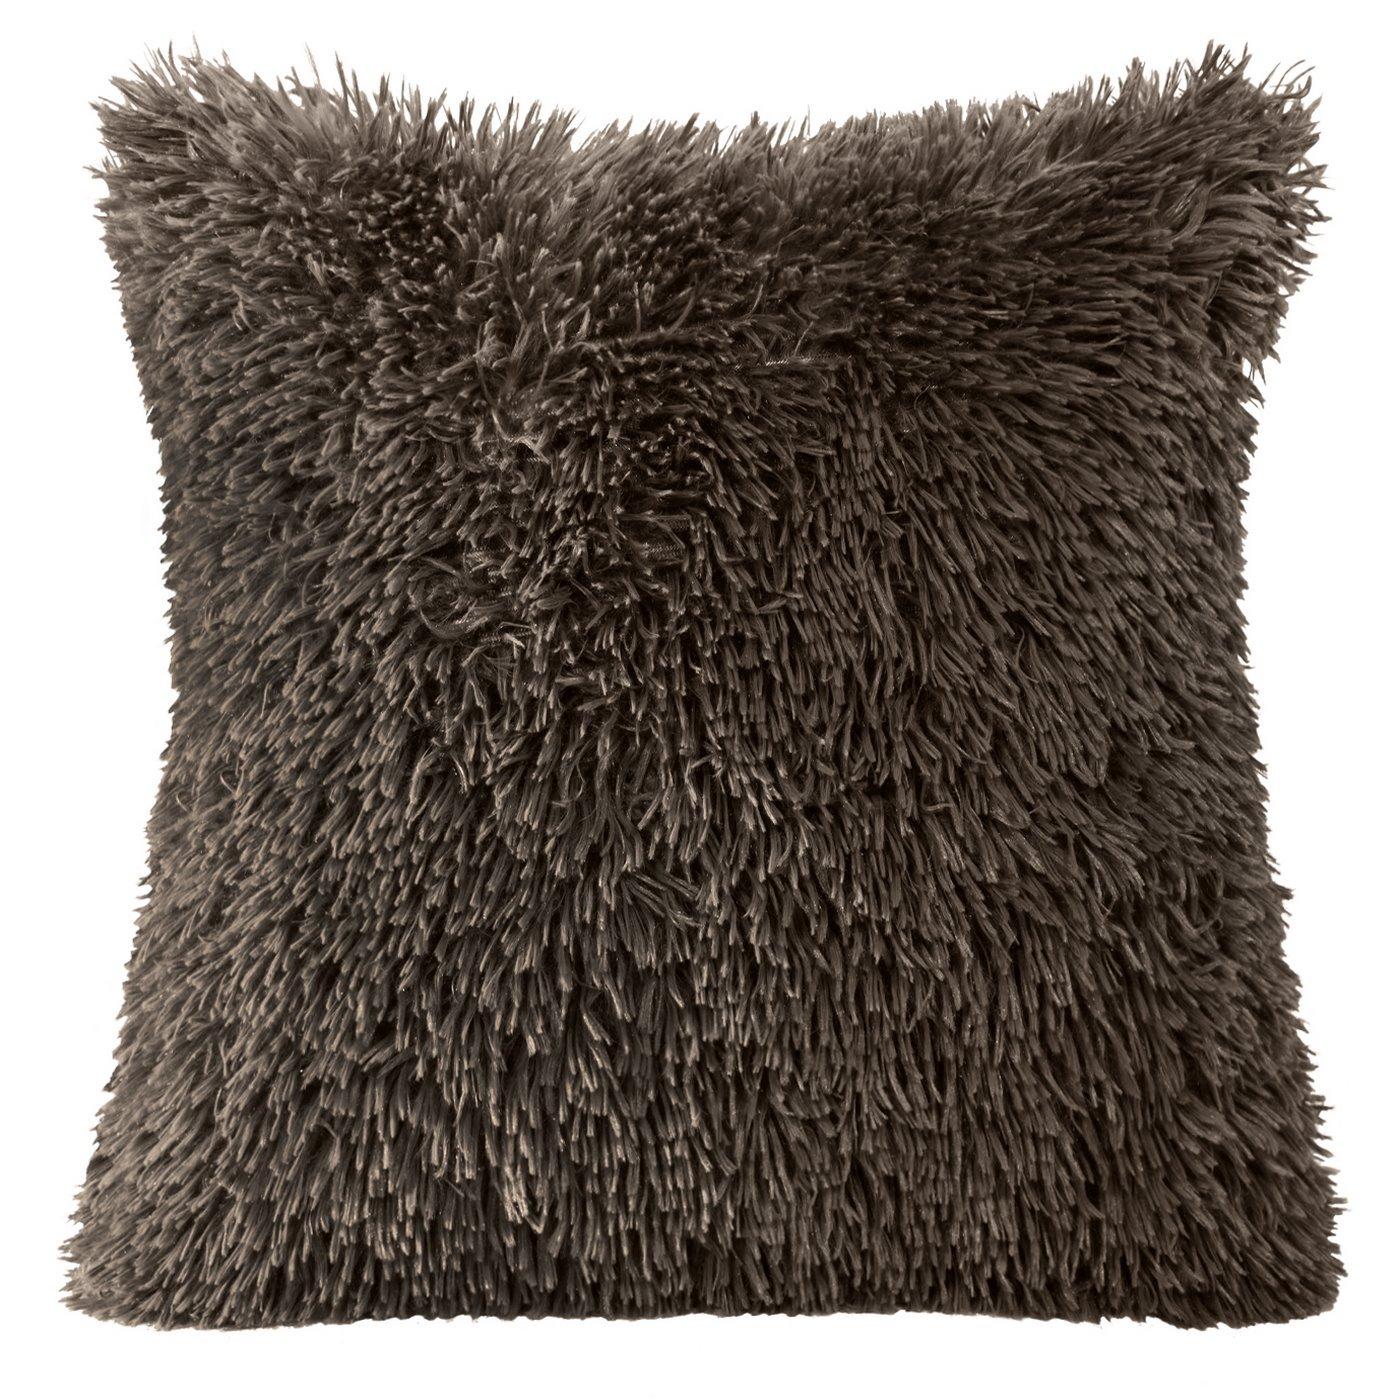 Poszewka na poduszkę 40 x 40 cm czarna futerko